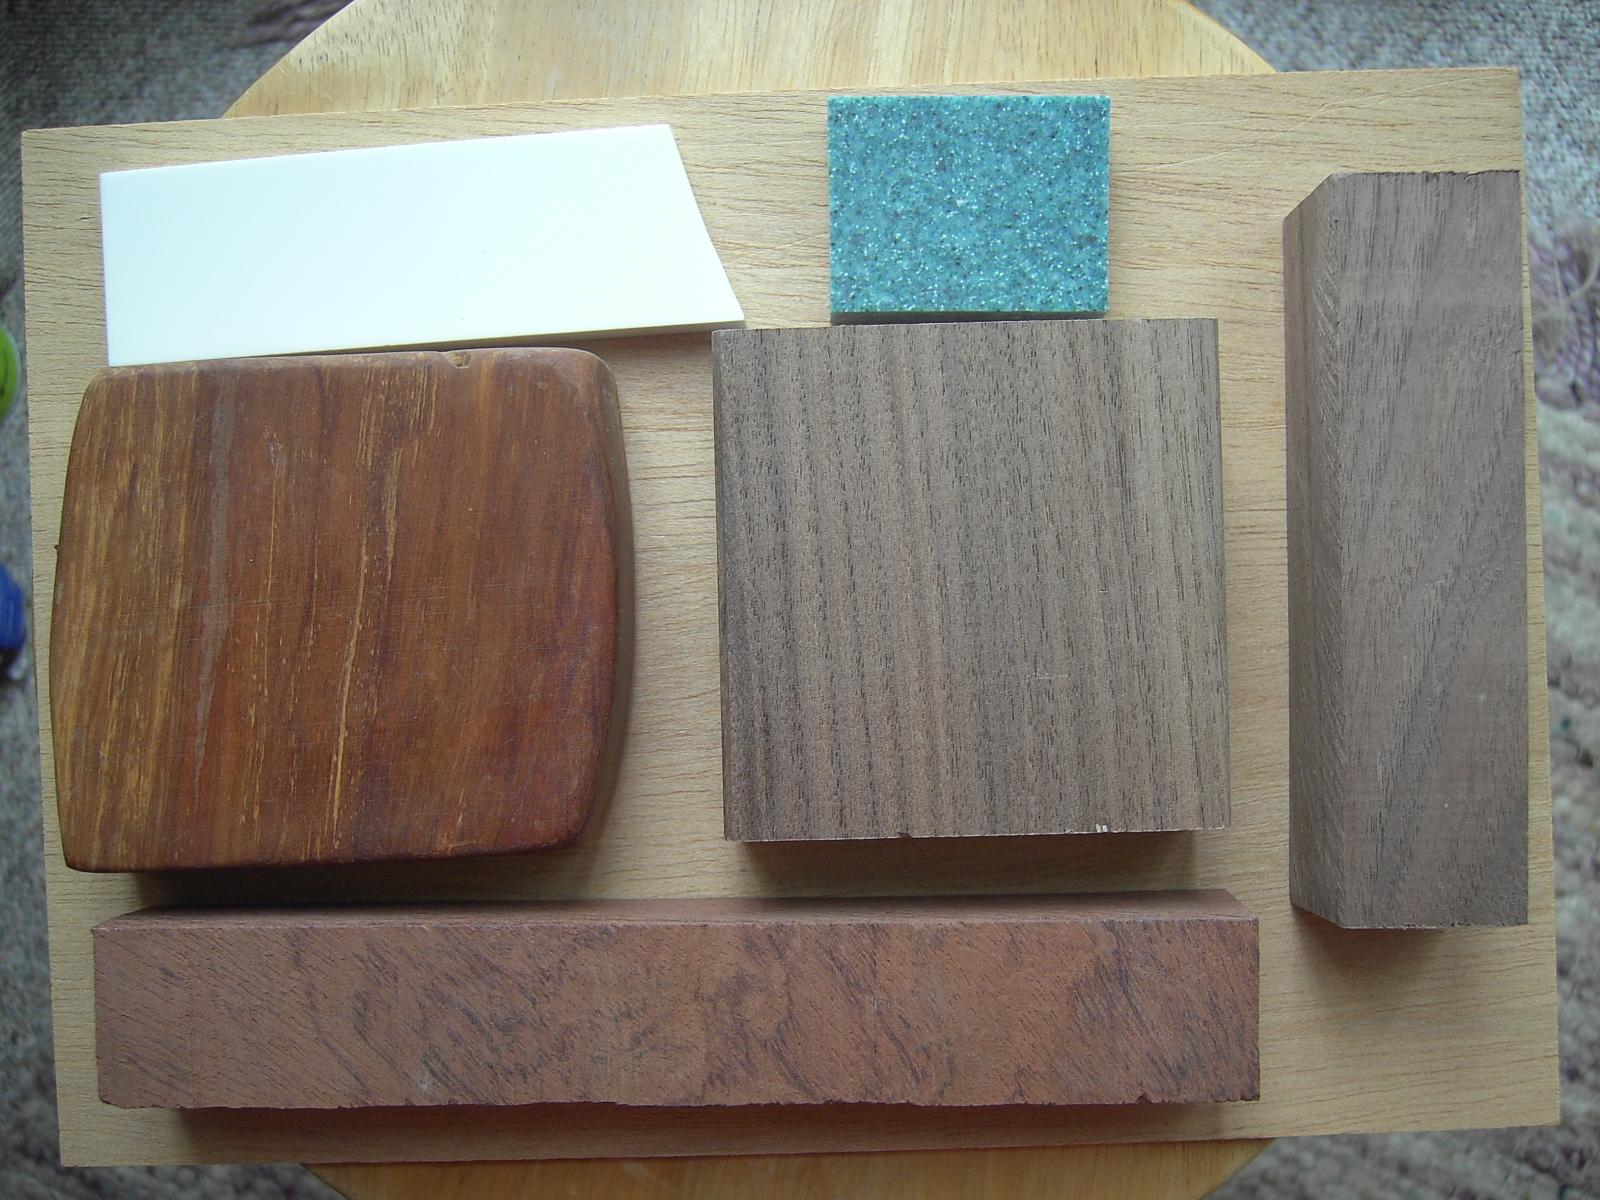 kokopelli design damaszener klinge damascene blade. Black Bedroom Furniture Sets. Home Design Ideas